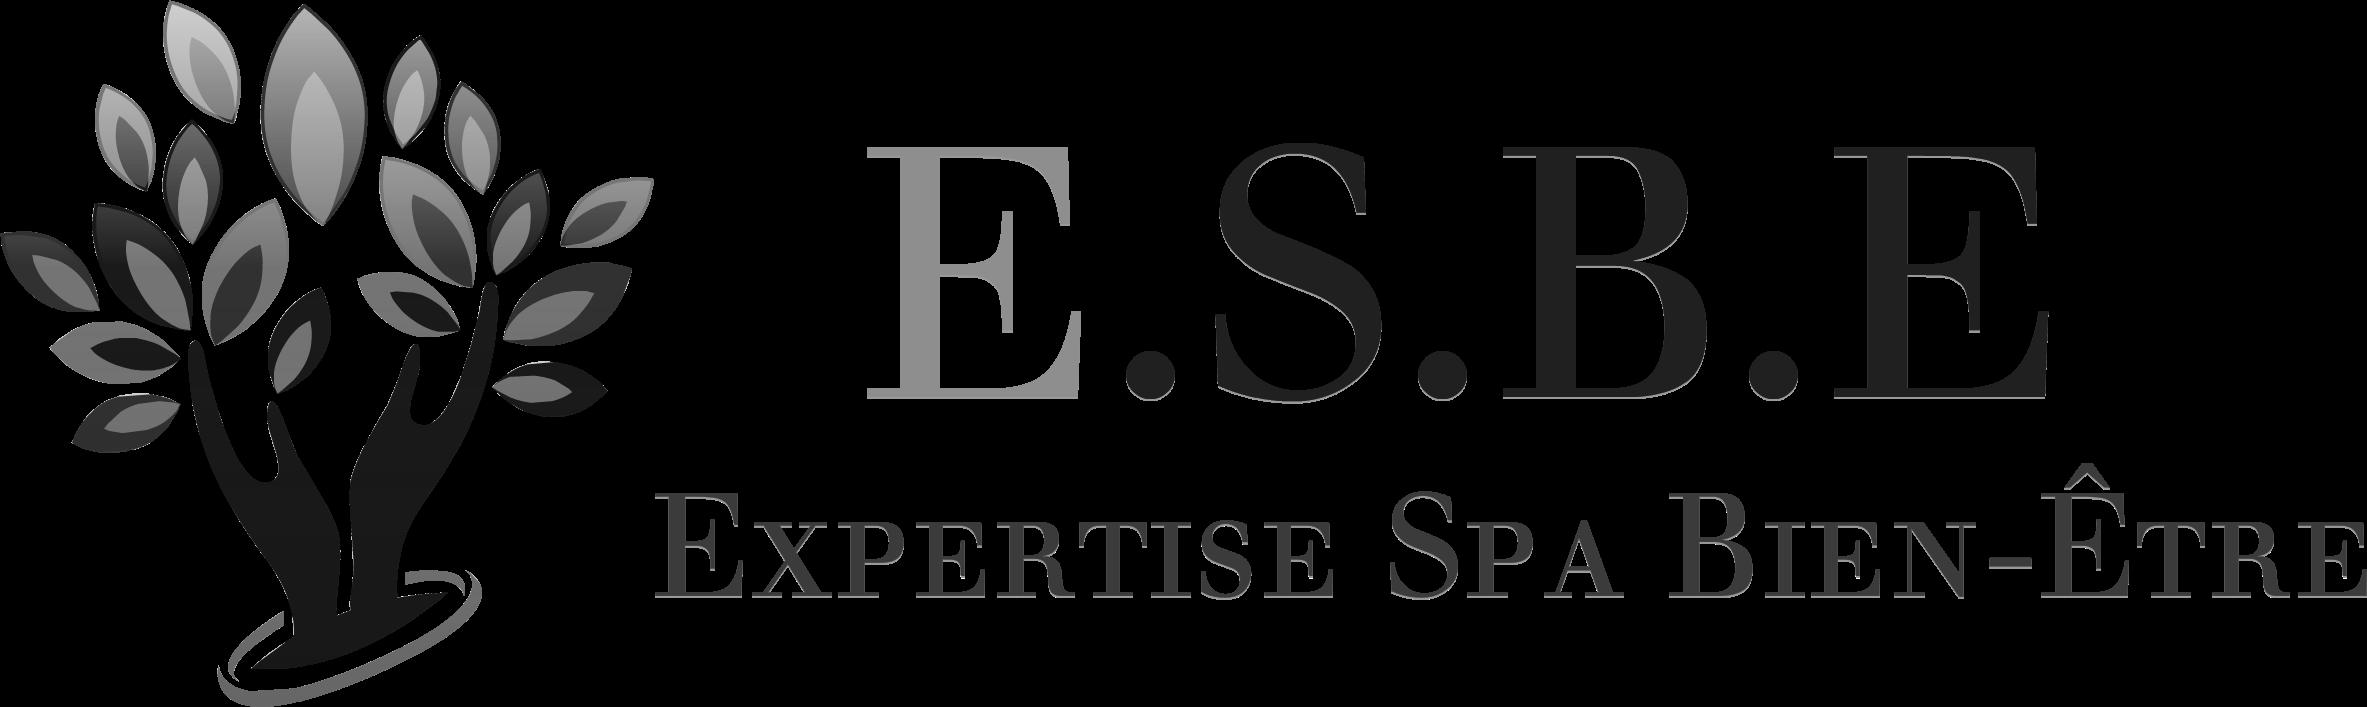 Les Ateliers d'E.S.B.E